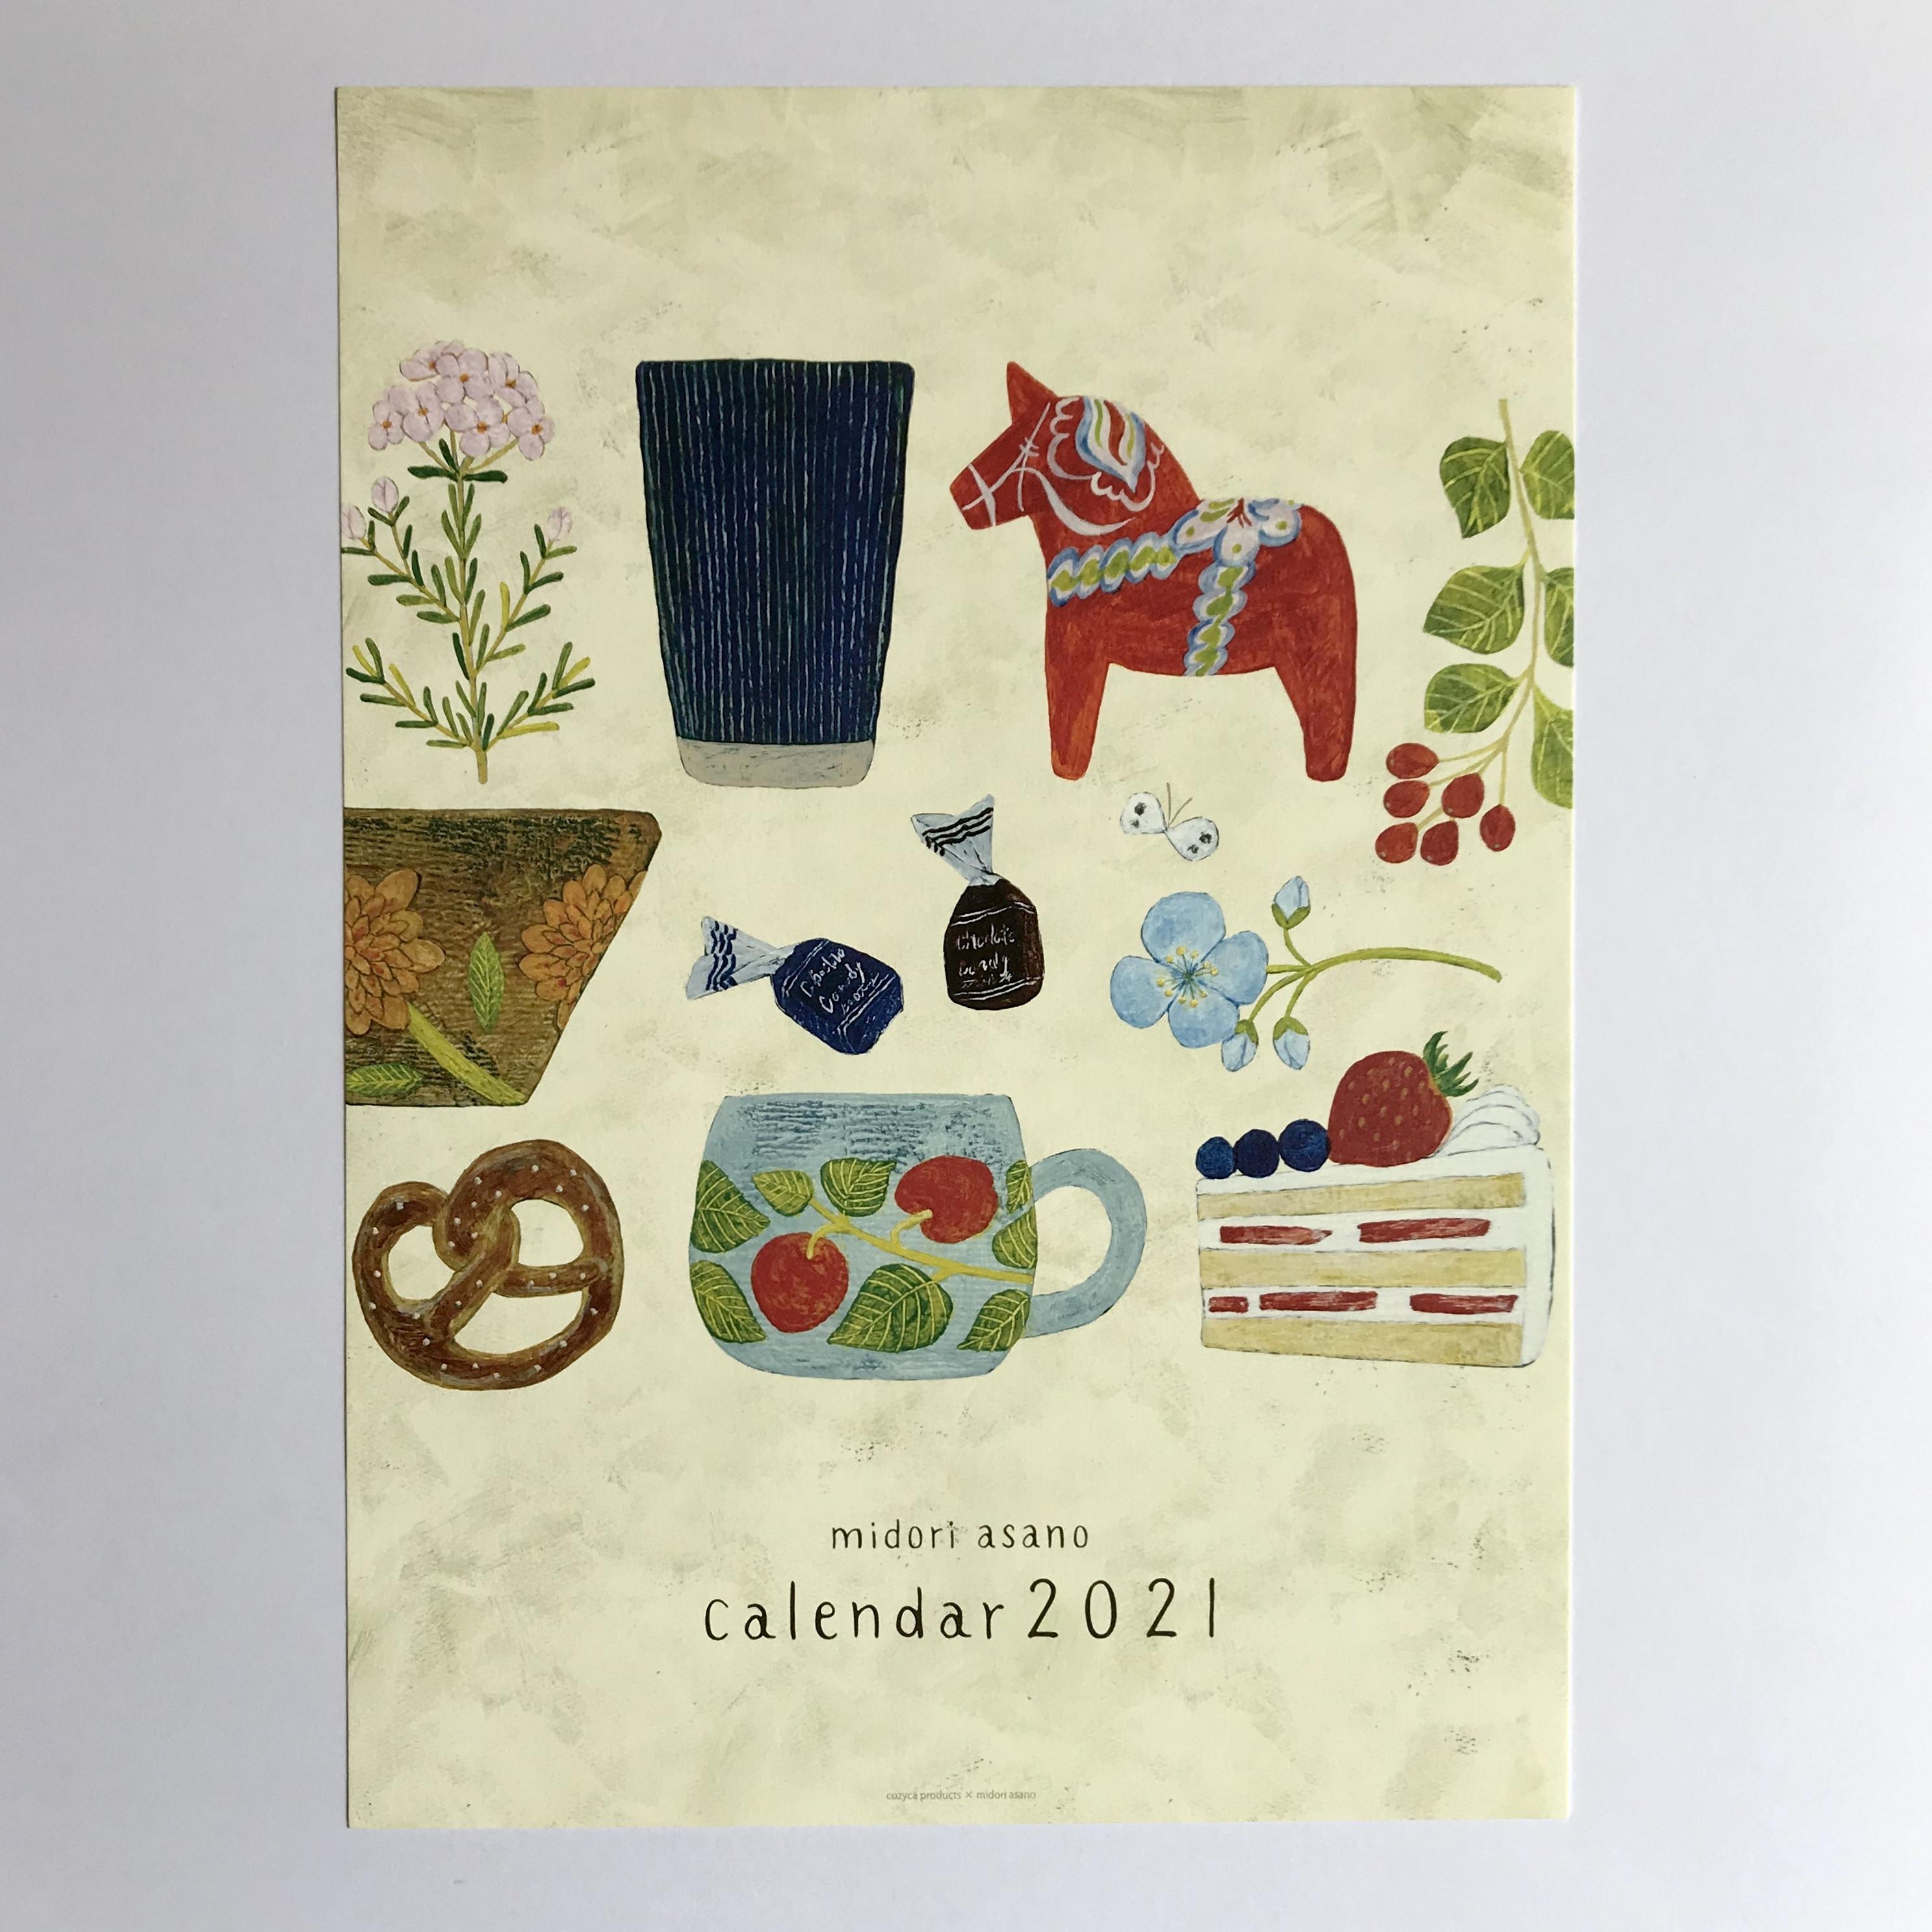 【cozyca products】2021カレンダー 浅野みどり